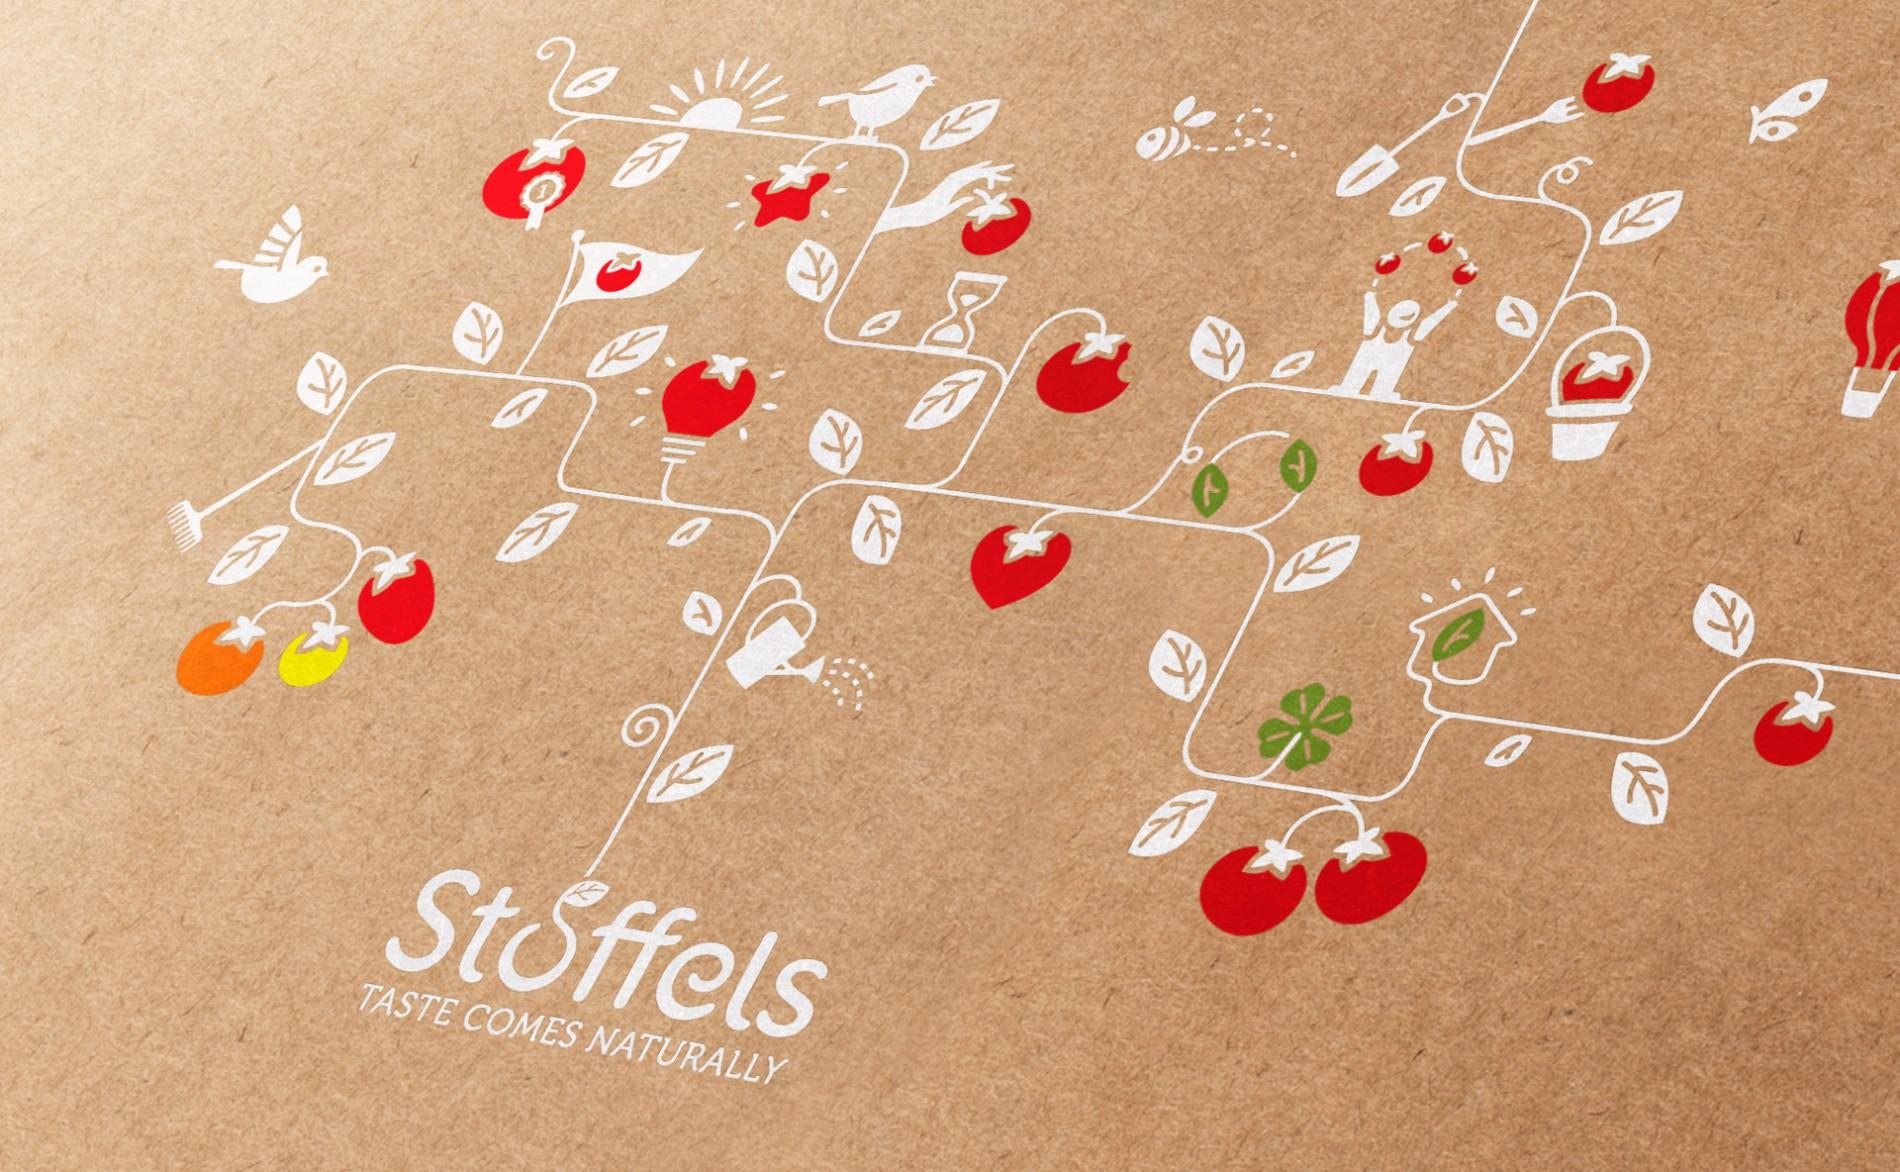 Quatre Mains package design - Package design stoffels, rebranding, tomatoes